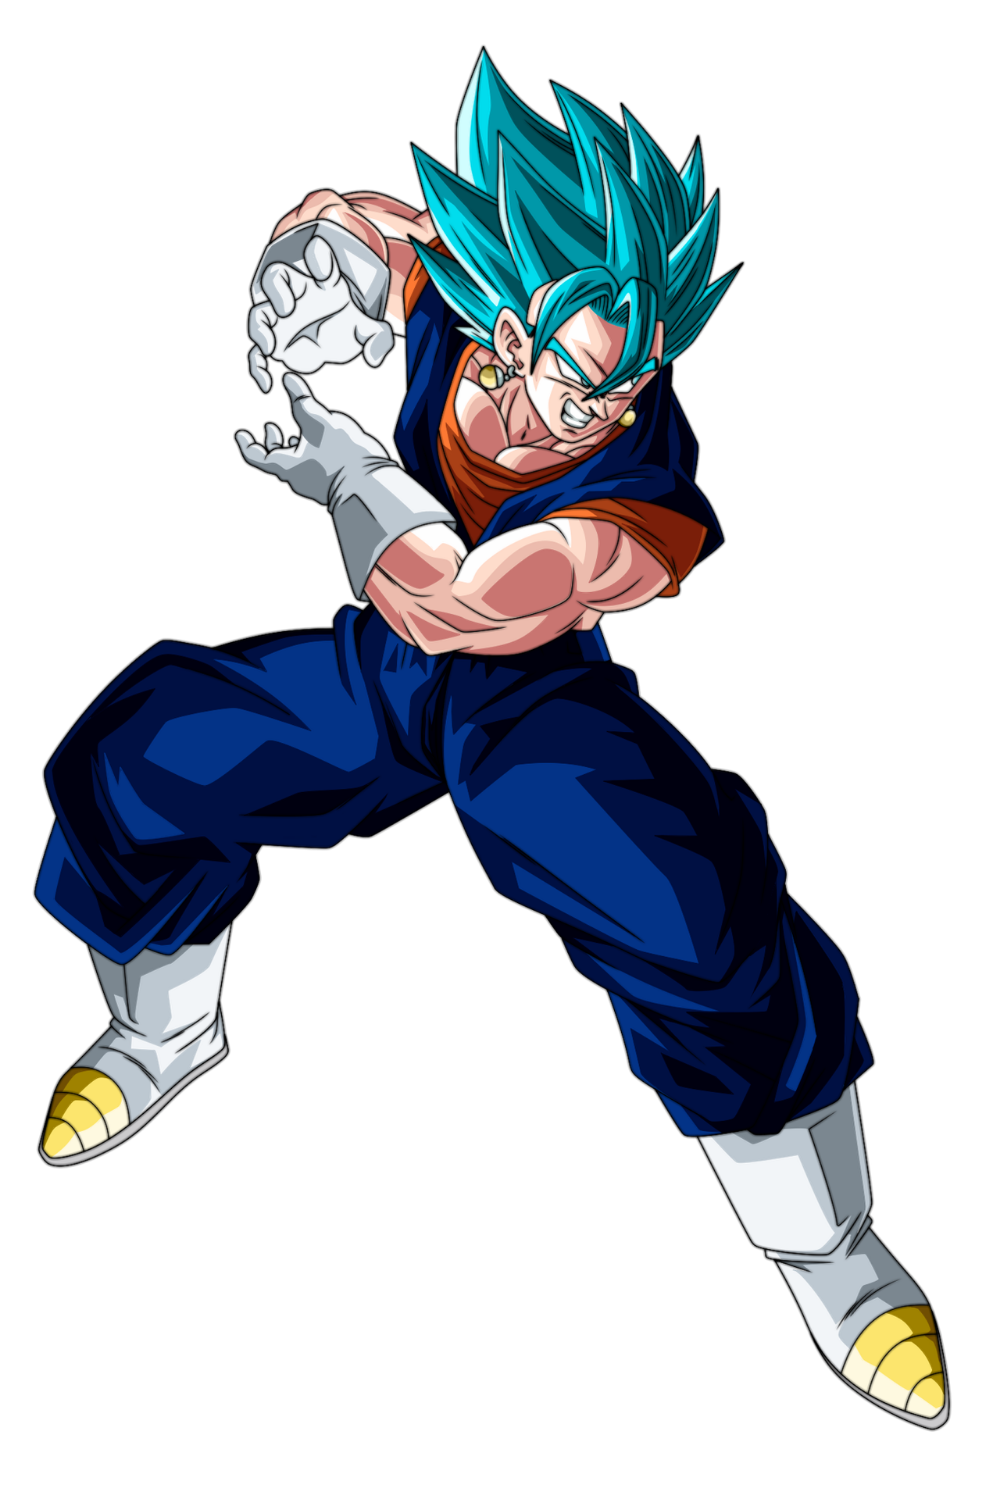 Vegetto Blue Render 2 By Ssjrose890 On Deviantart Anime Dragon Ball Super Dragon Ball Super Manga Dragon Ball Art